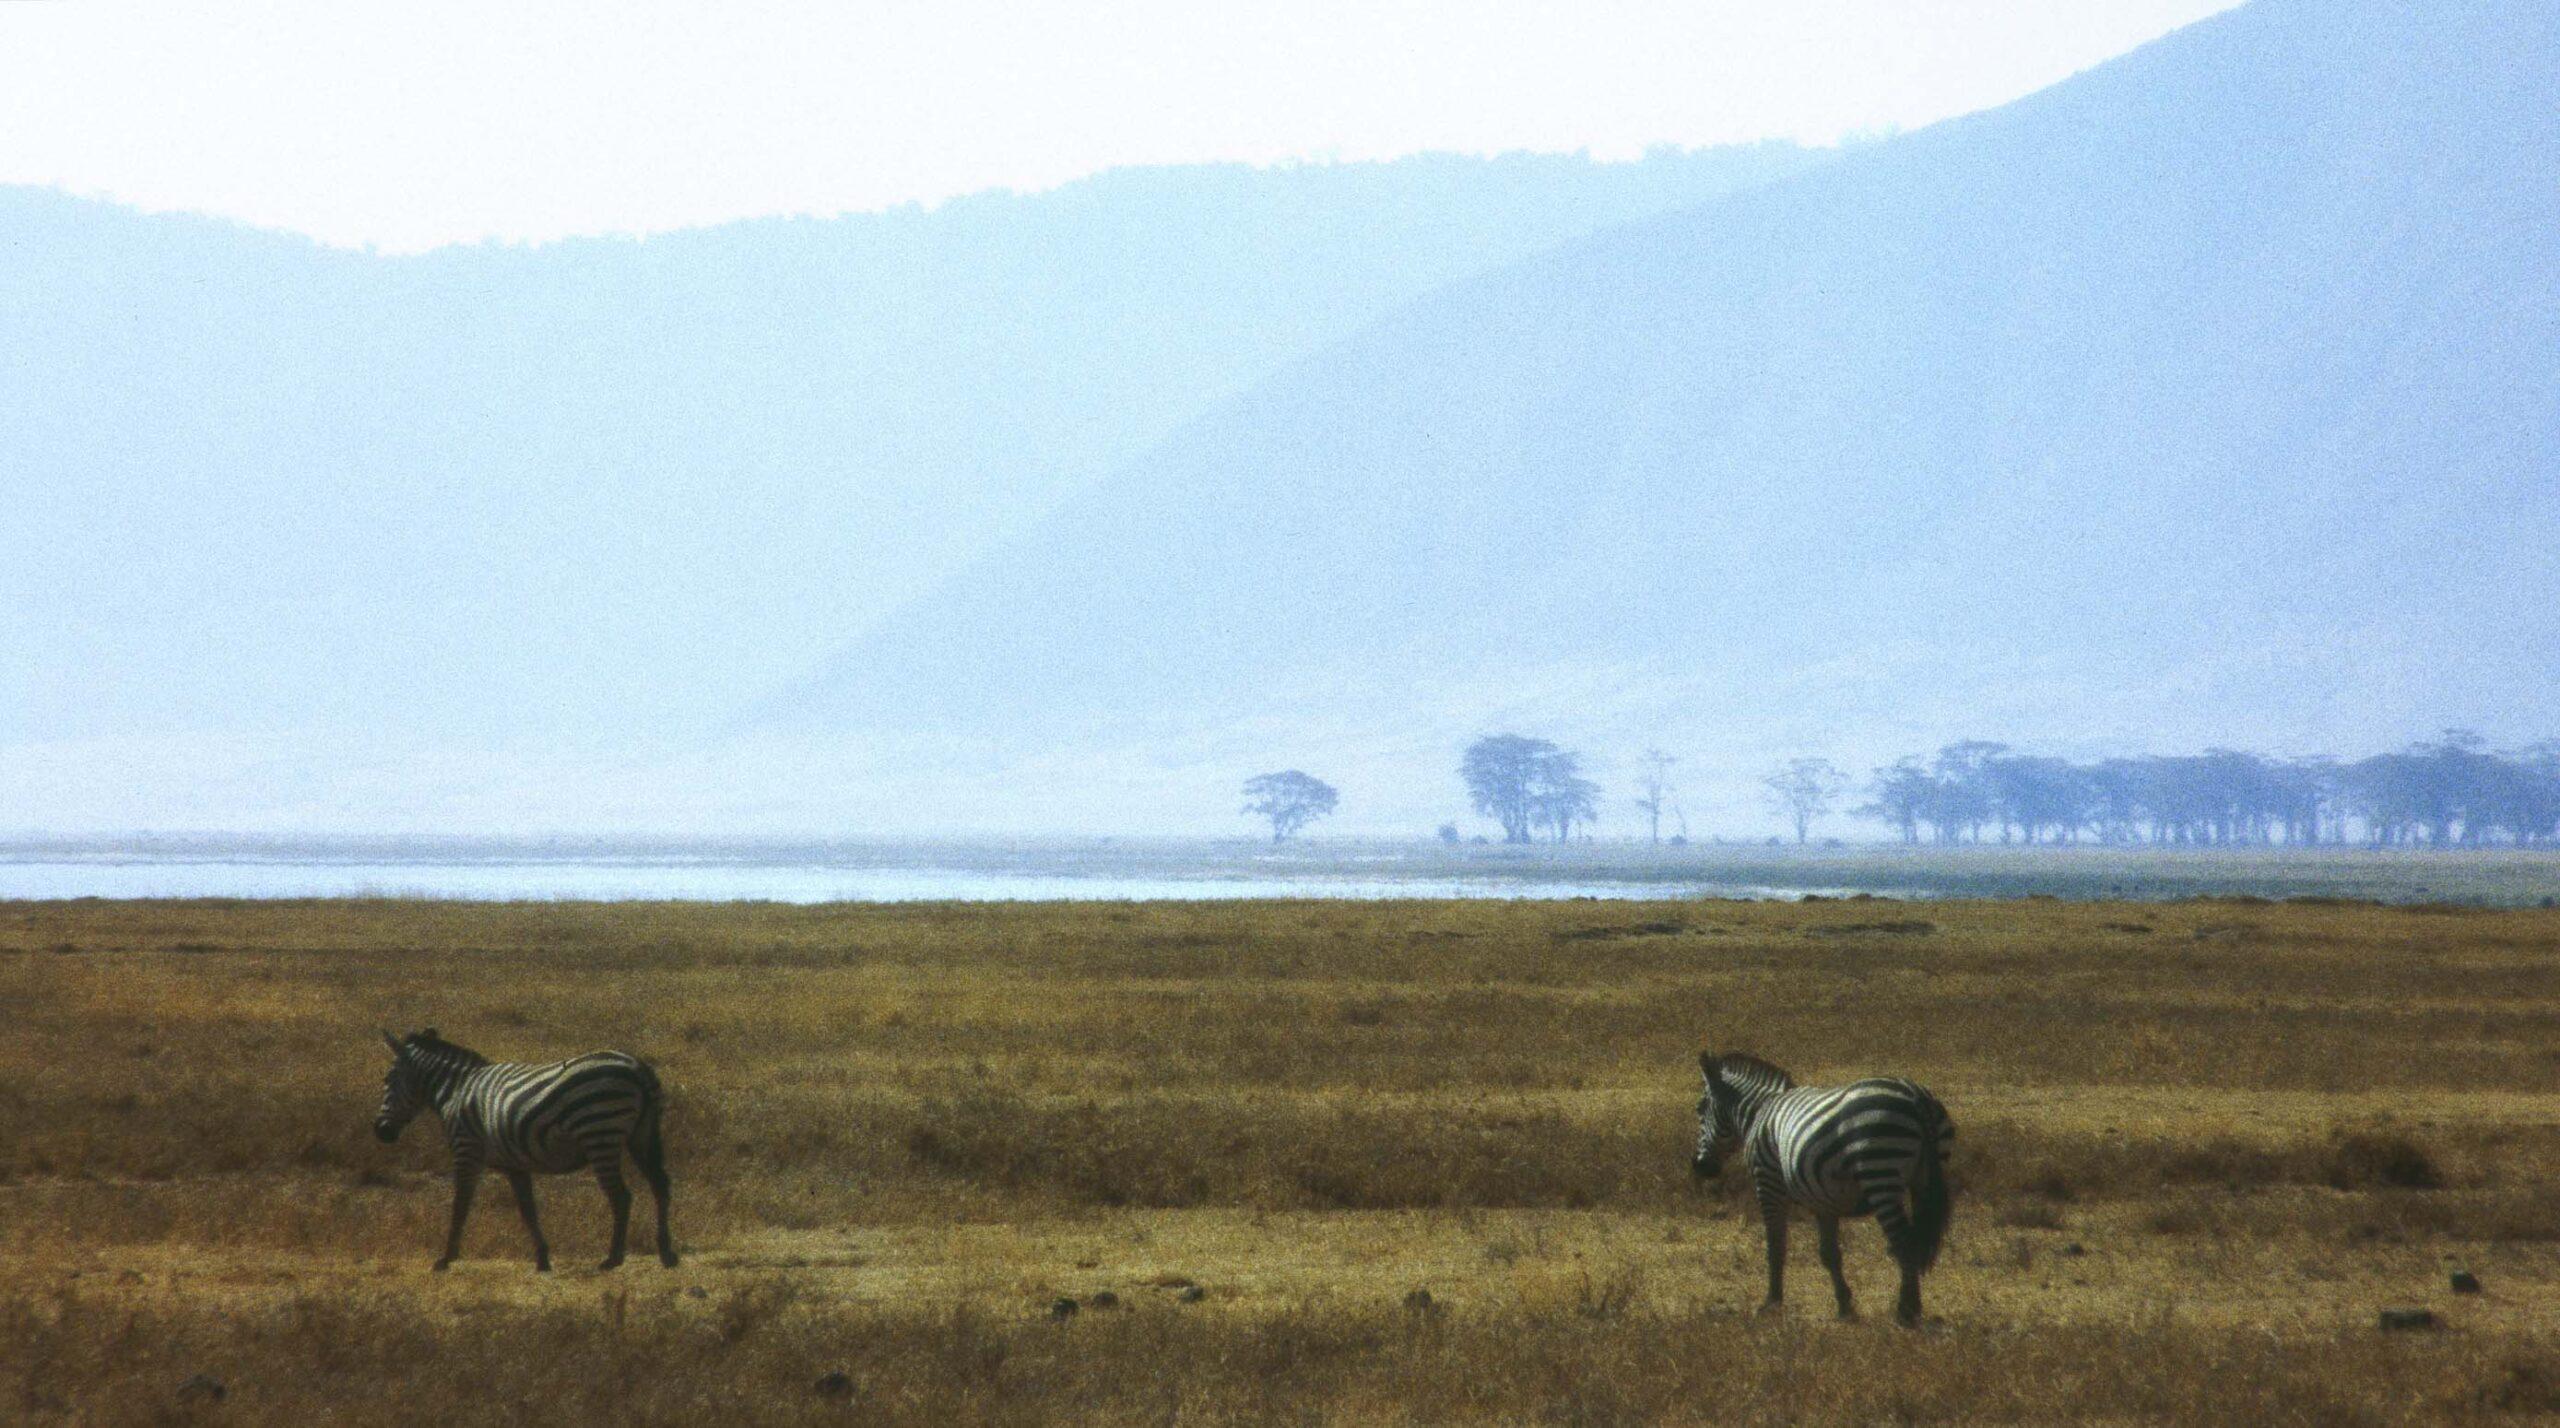 Two zebras with hazy hills beyond